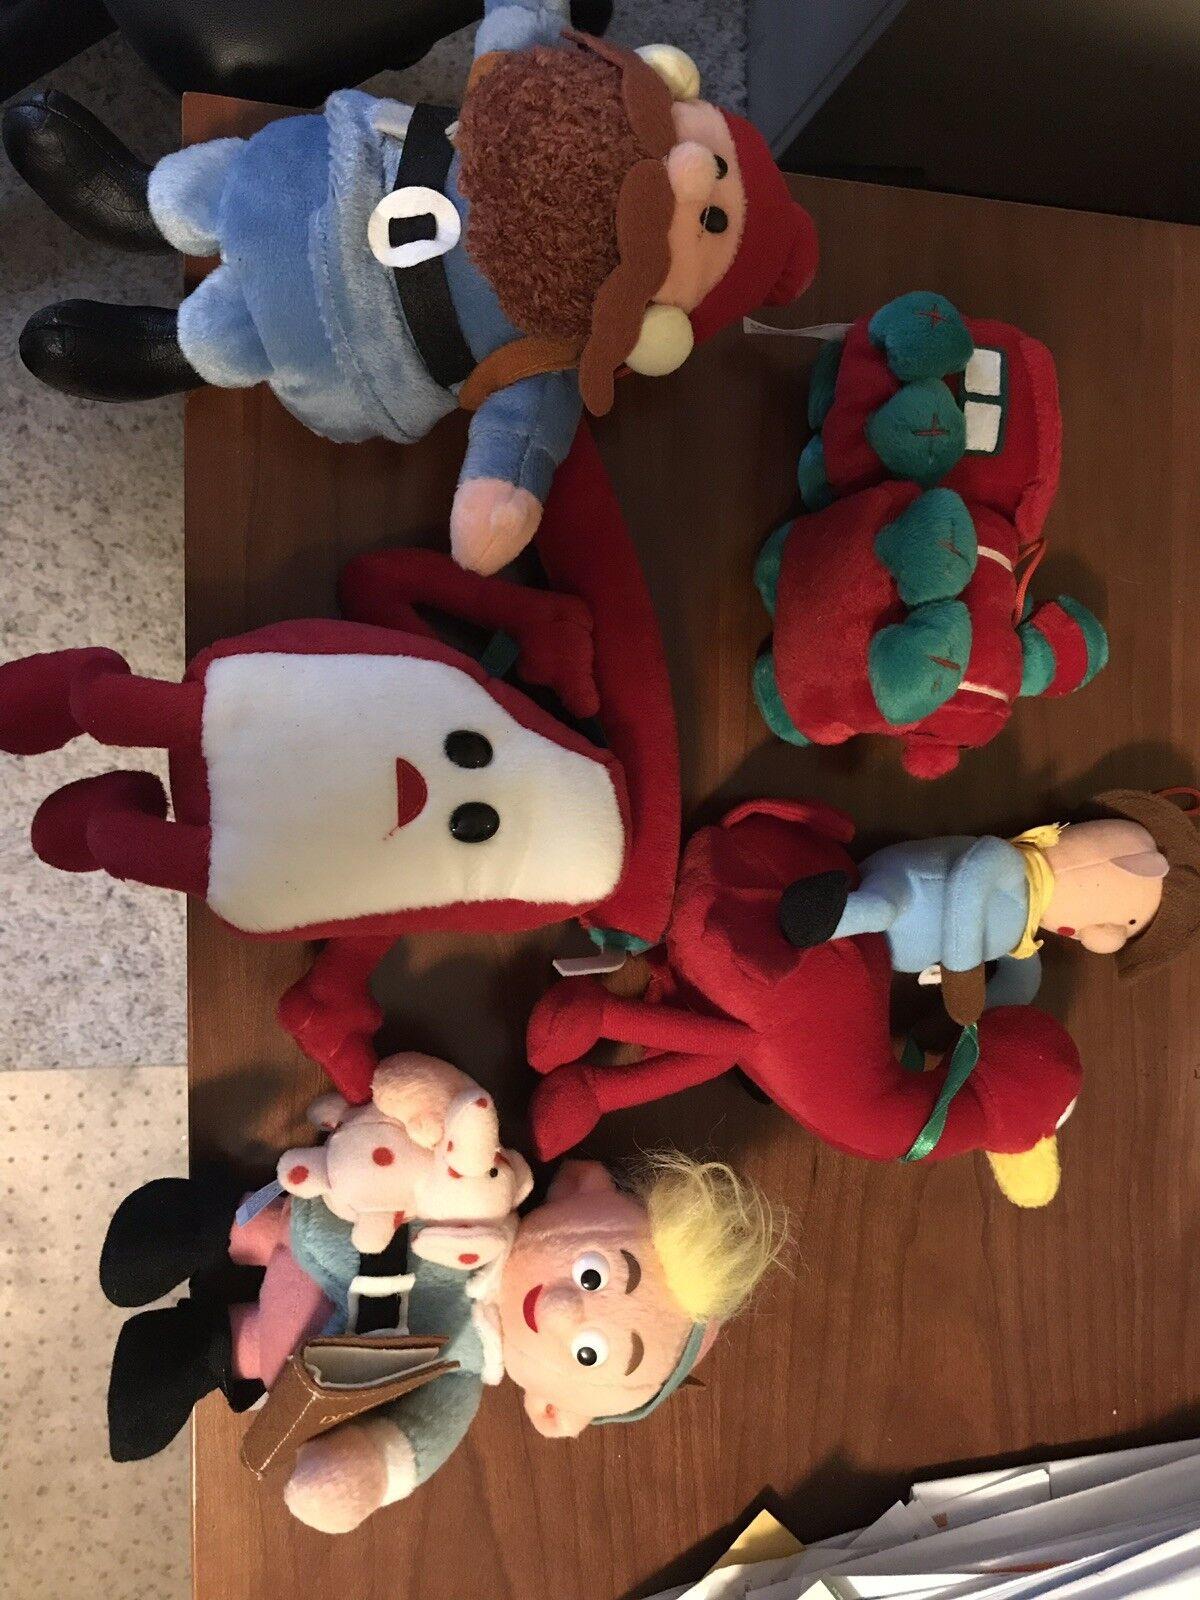 5 CVS Island of Misfit Toys STUFFINS Plush Stuffed Lot